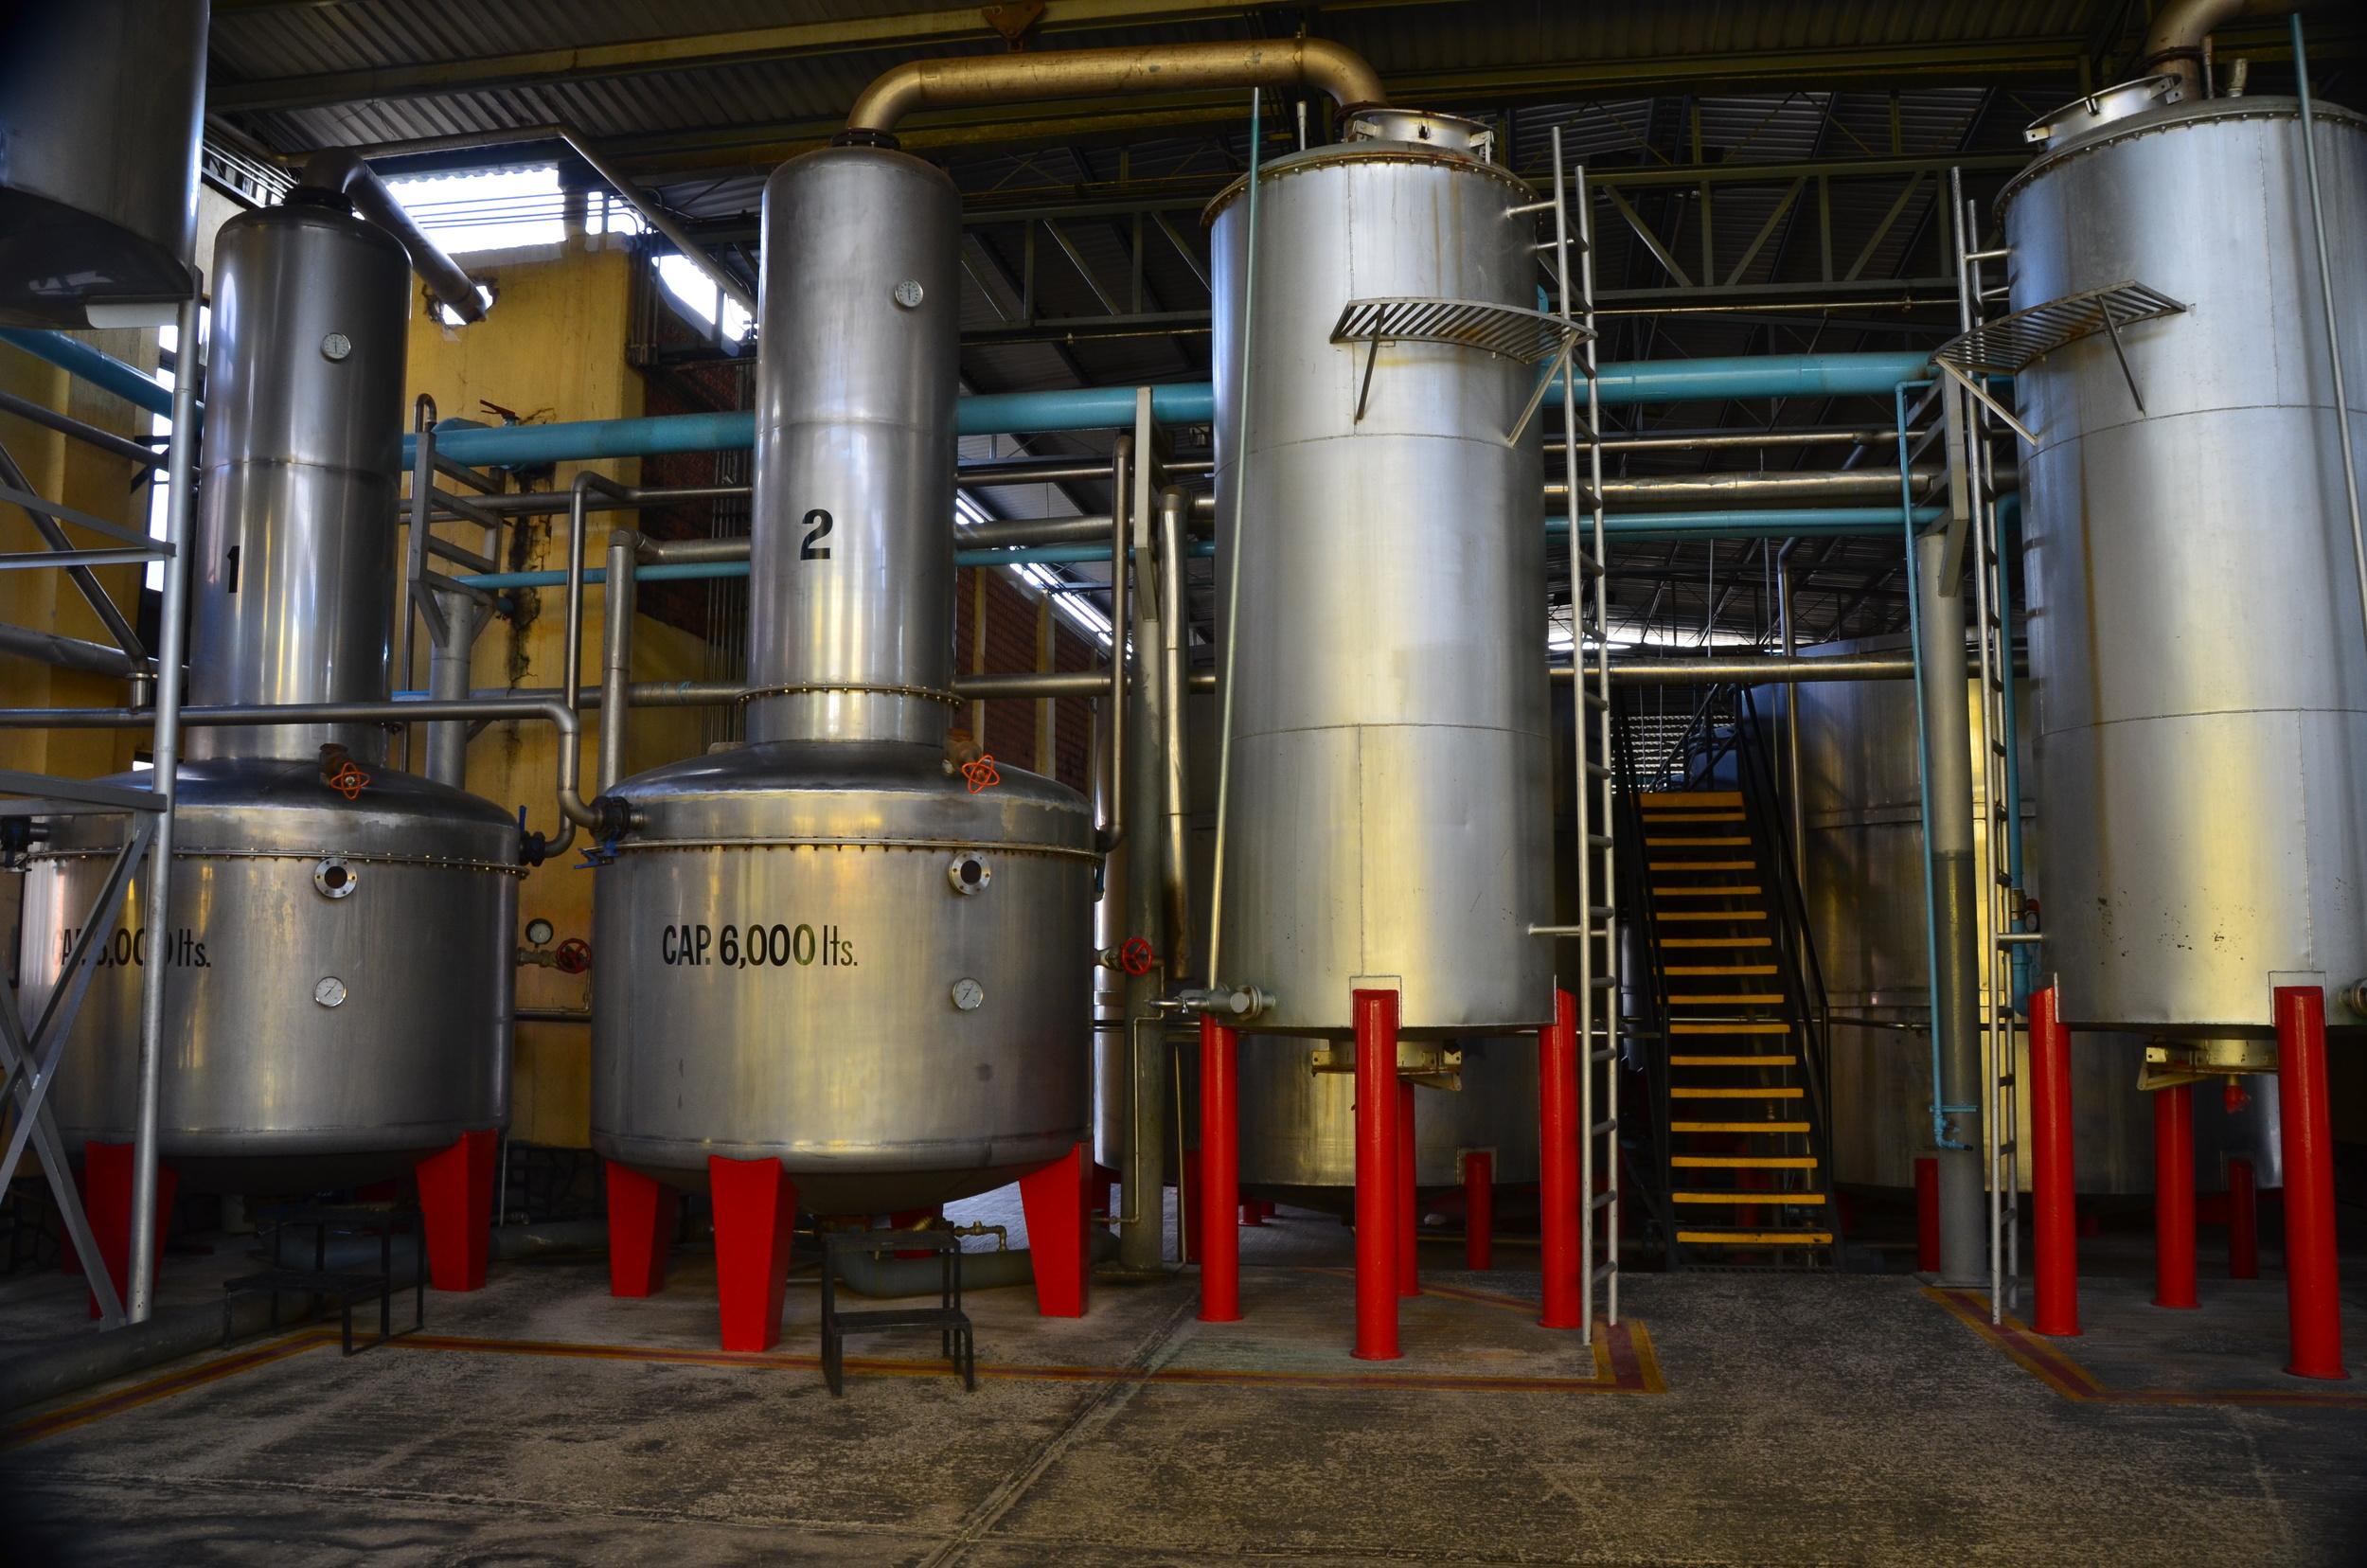 The distillation vats